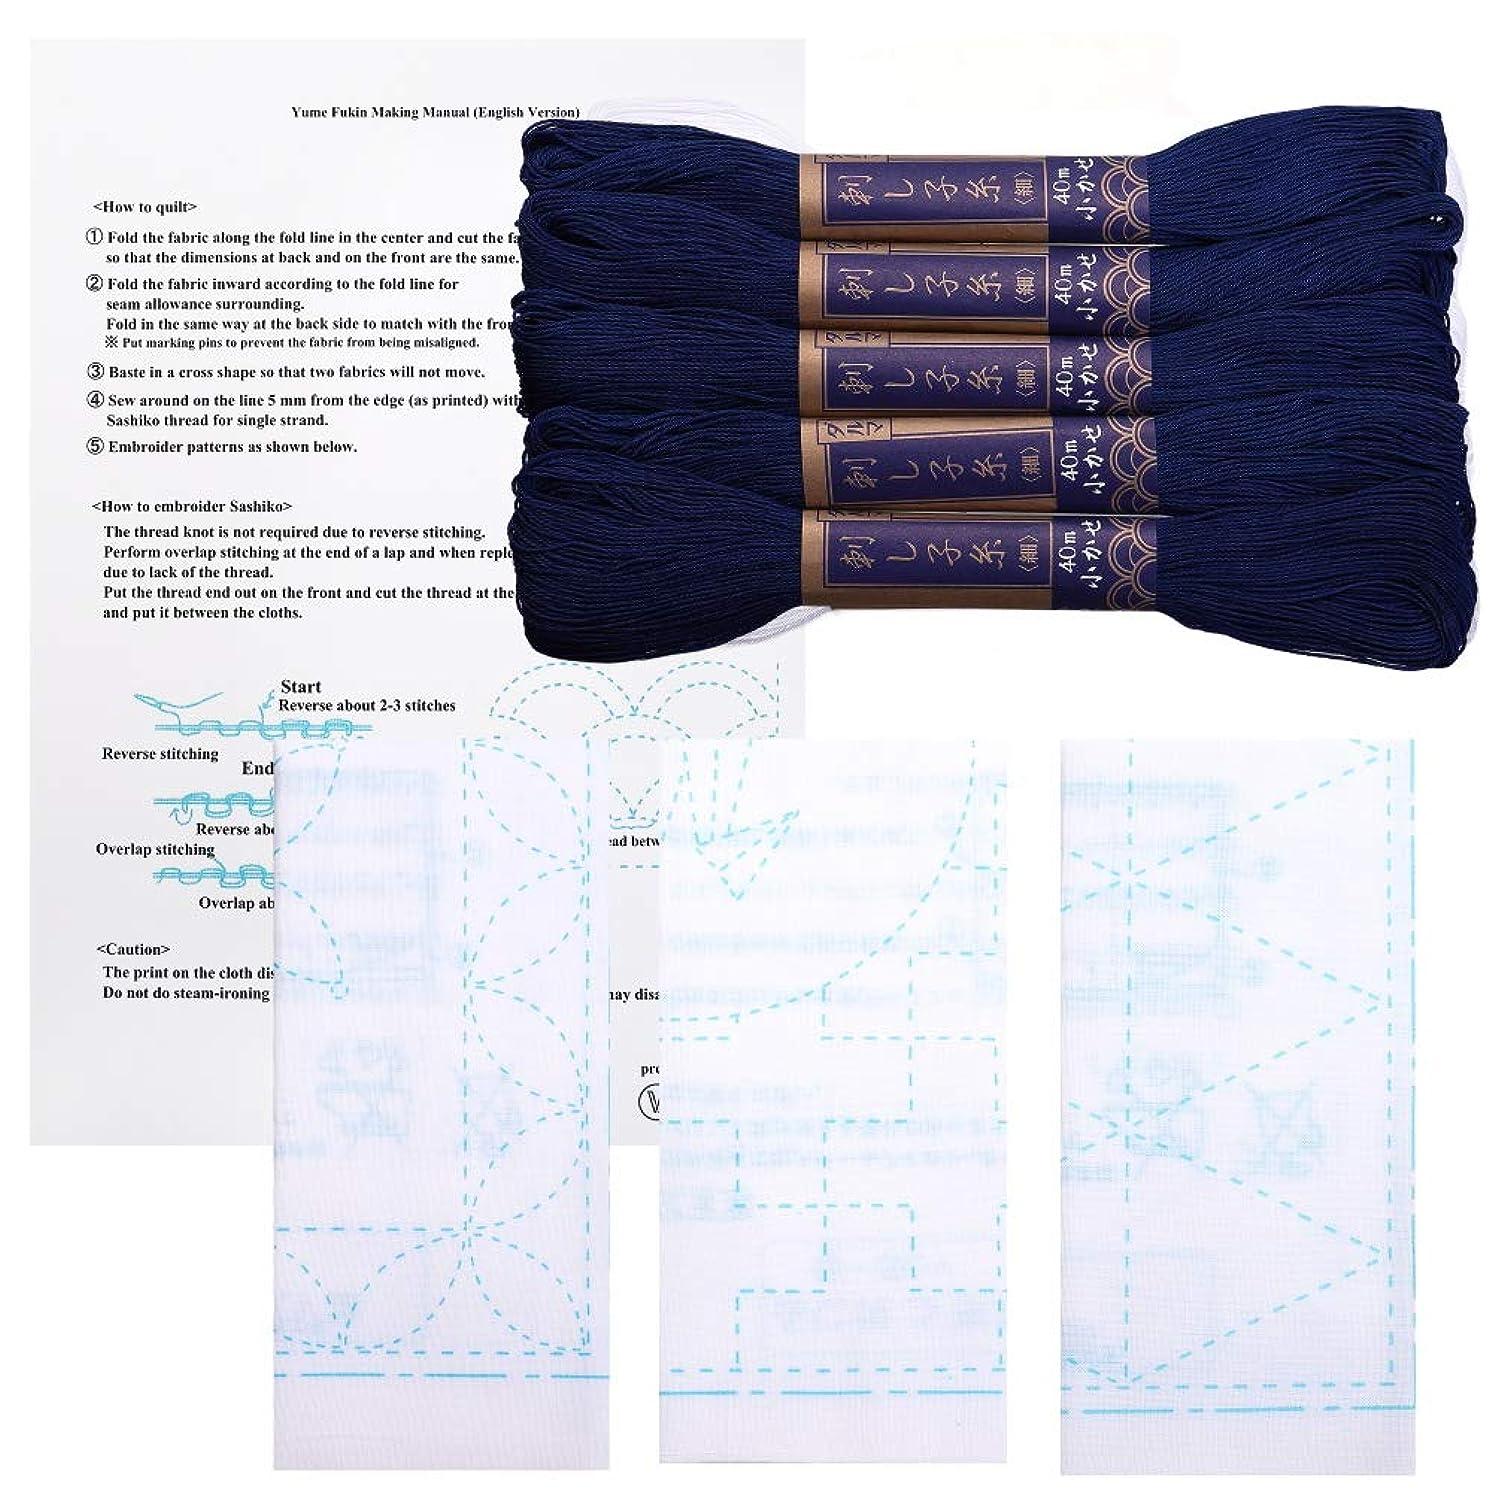 Sashiko kit   Yokota Sashiko Thread and Template Yume Fukin with Original English Manual, Fabric, Japanese Textile (Navy Thread/White Dishcloth 3)